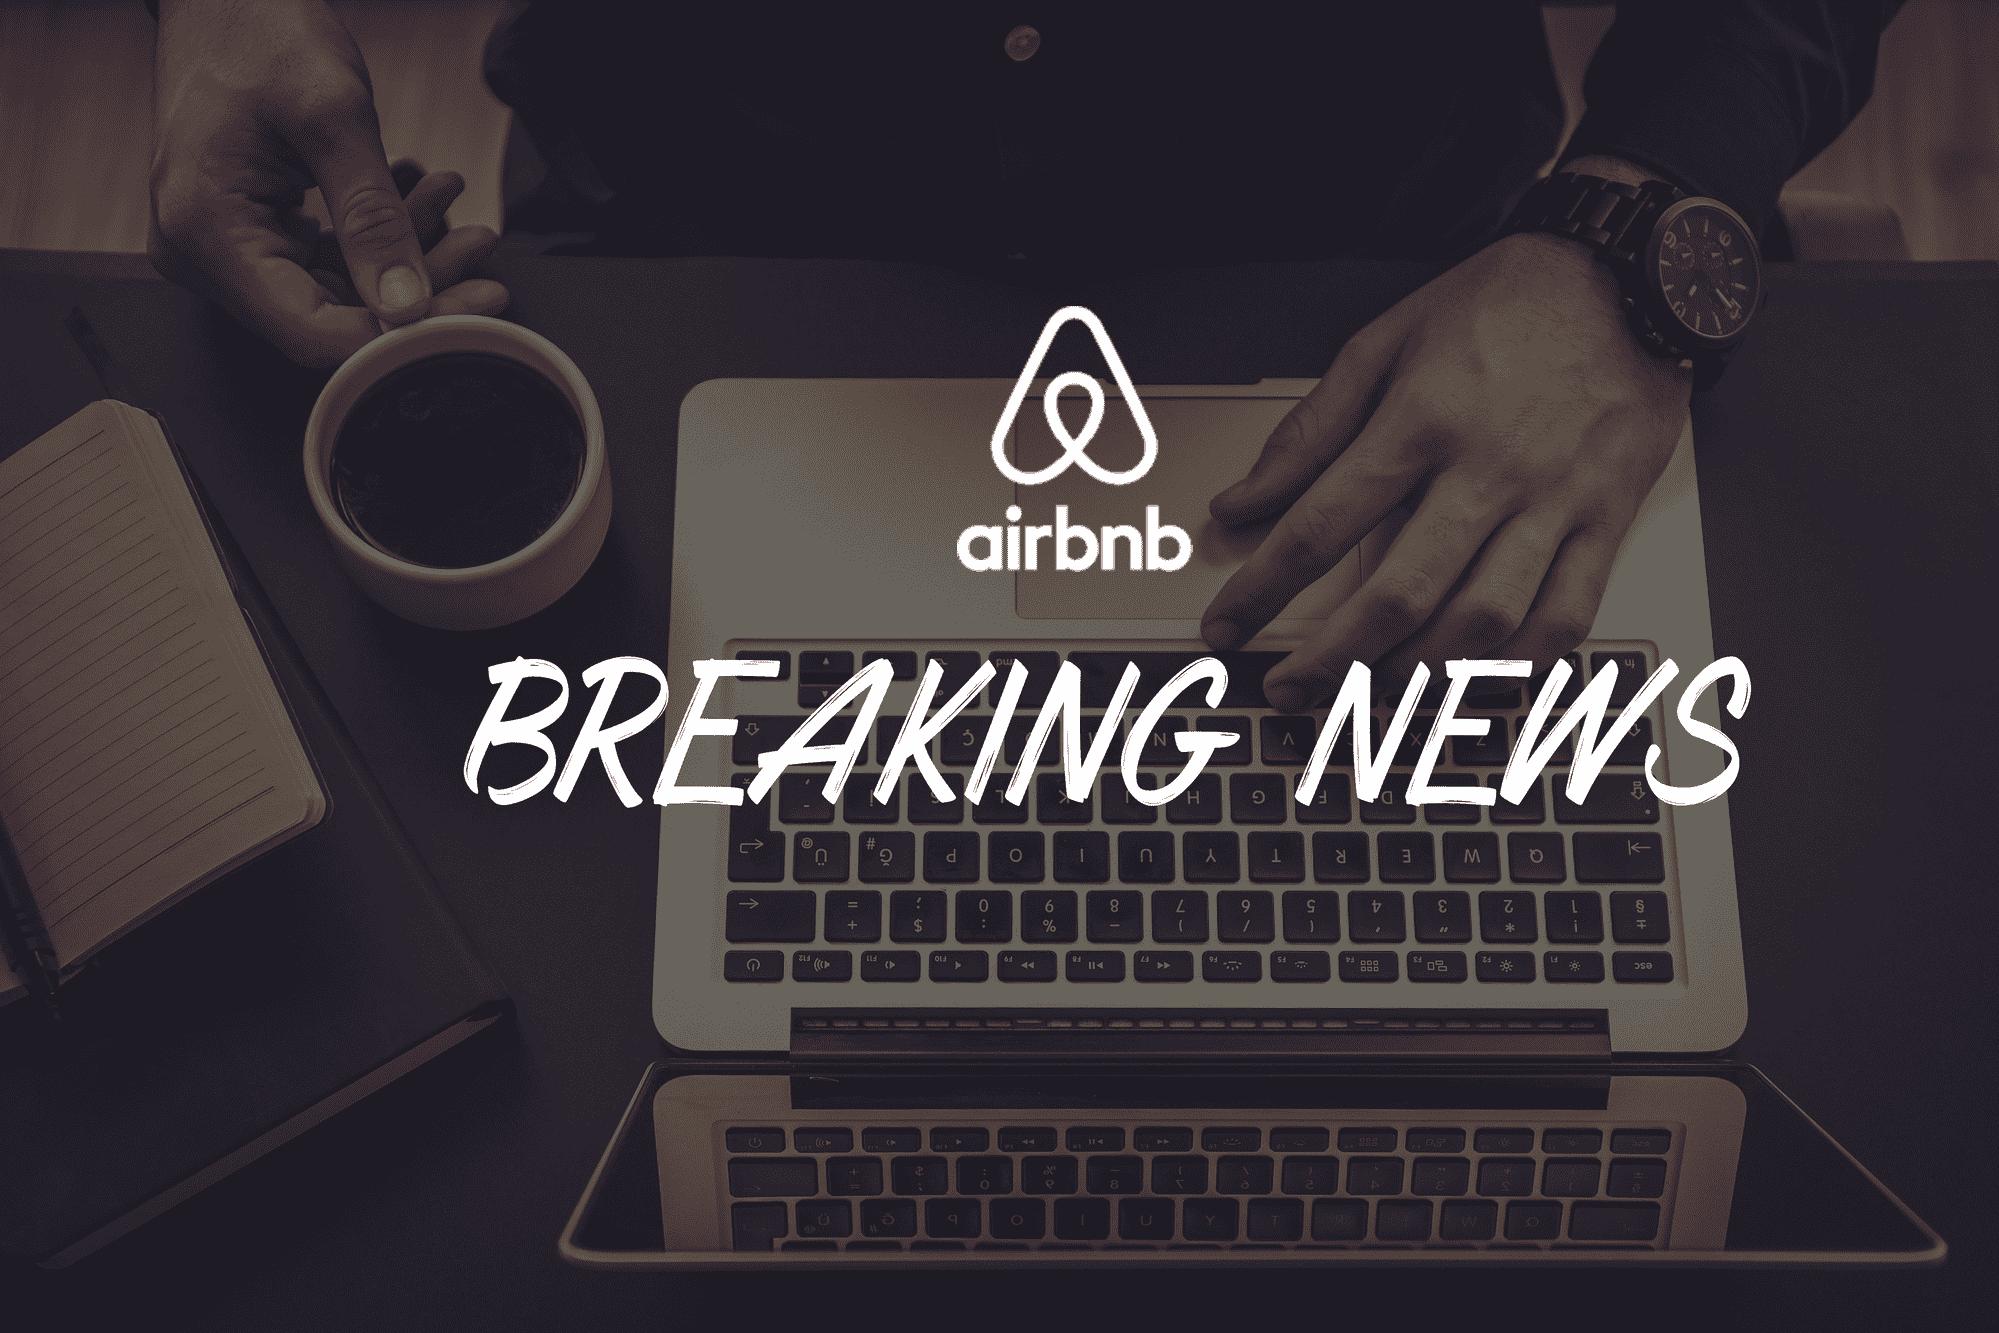 Airbnb update news